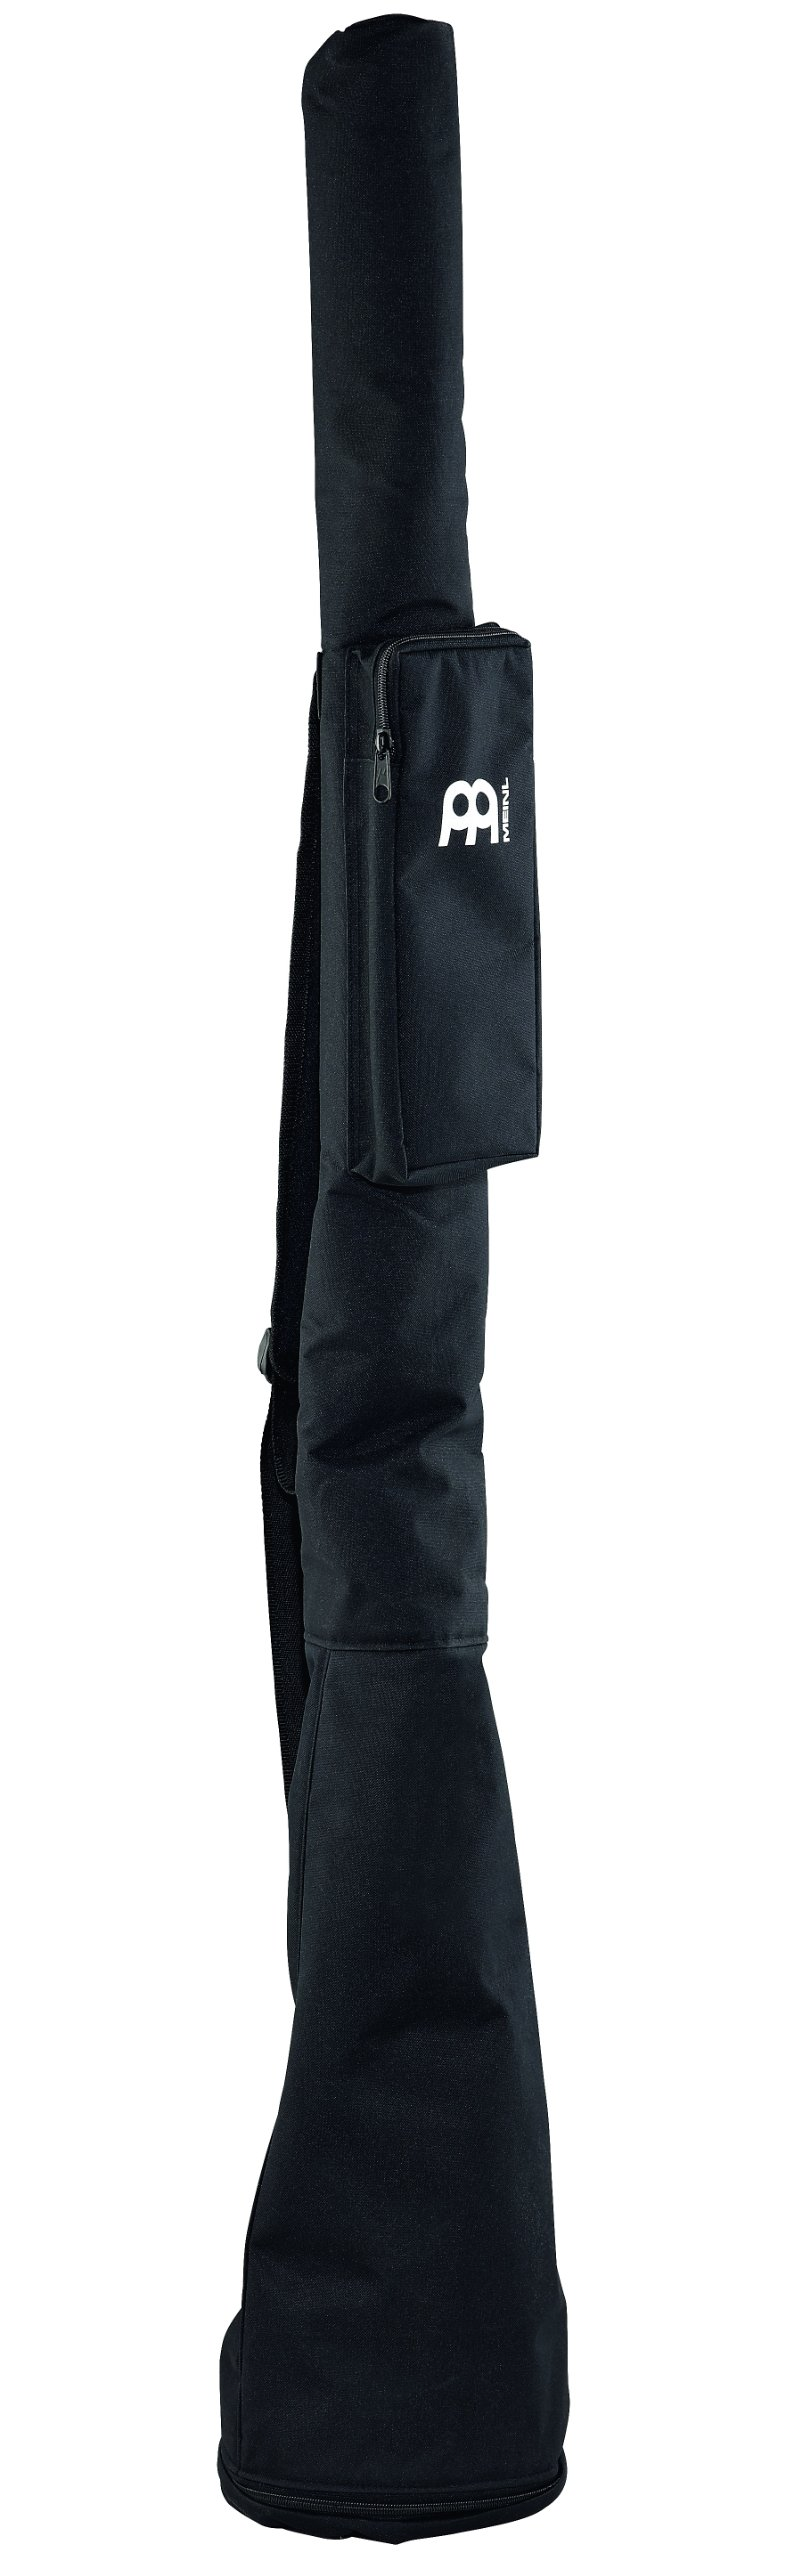 Meinl Percussion MDDGB-PRO Professional Didgeridoo Bag, Black